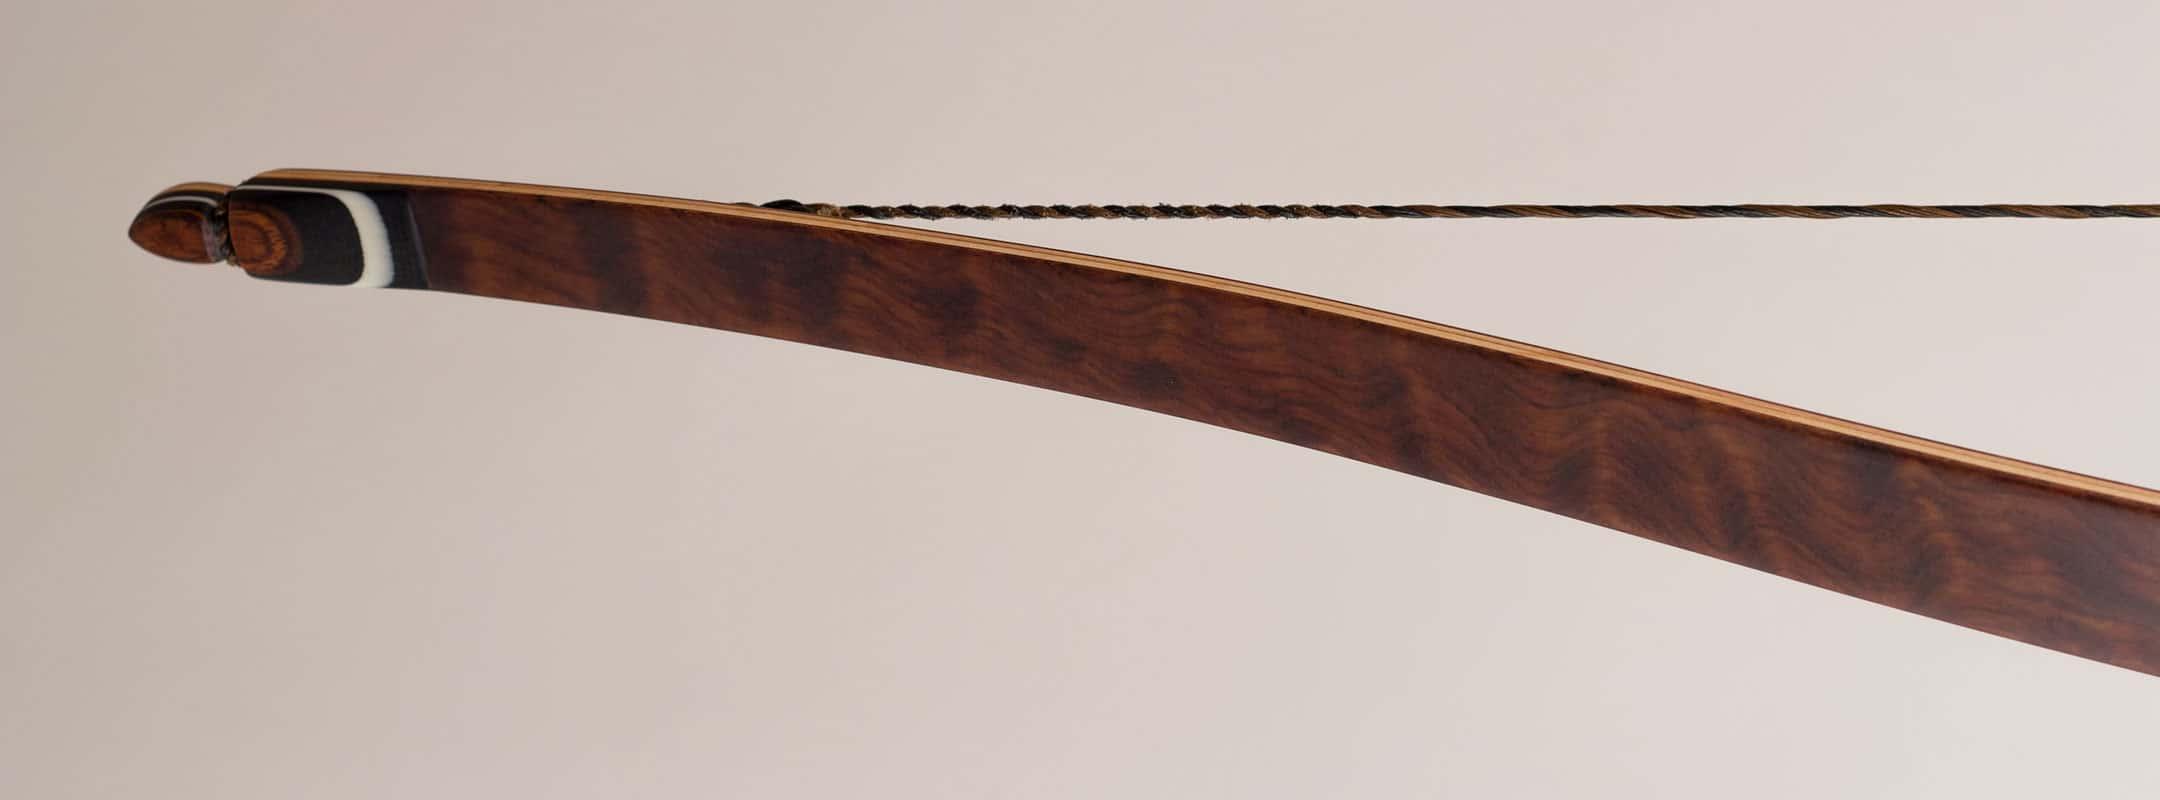 Bubinga limbs on a traditional longbow